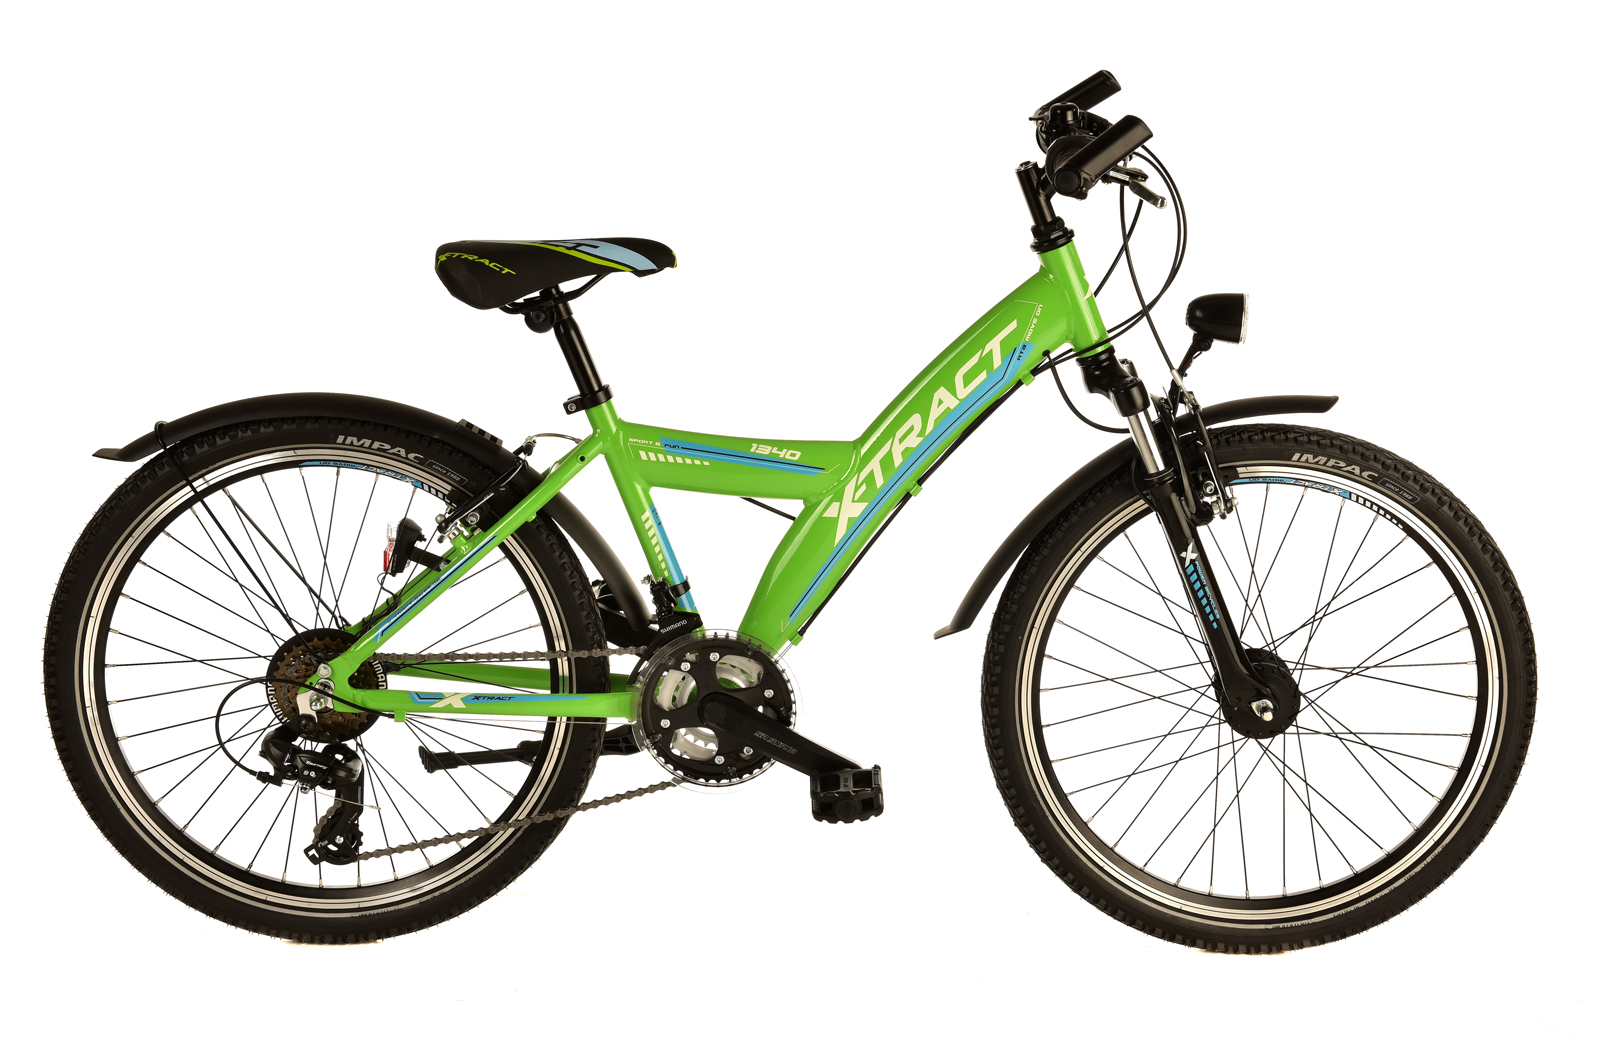 X Tract 1340 Feldmeier Bikes